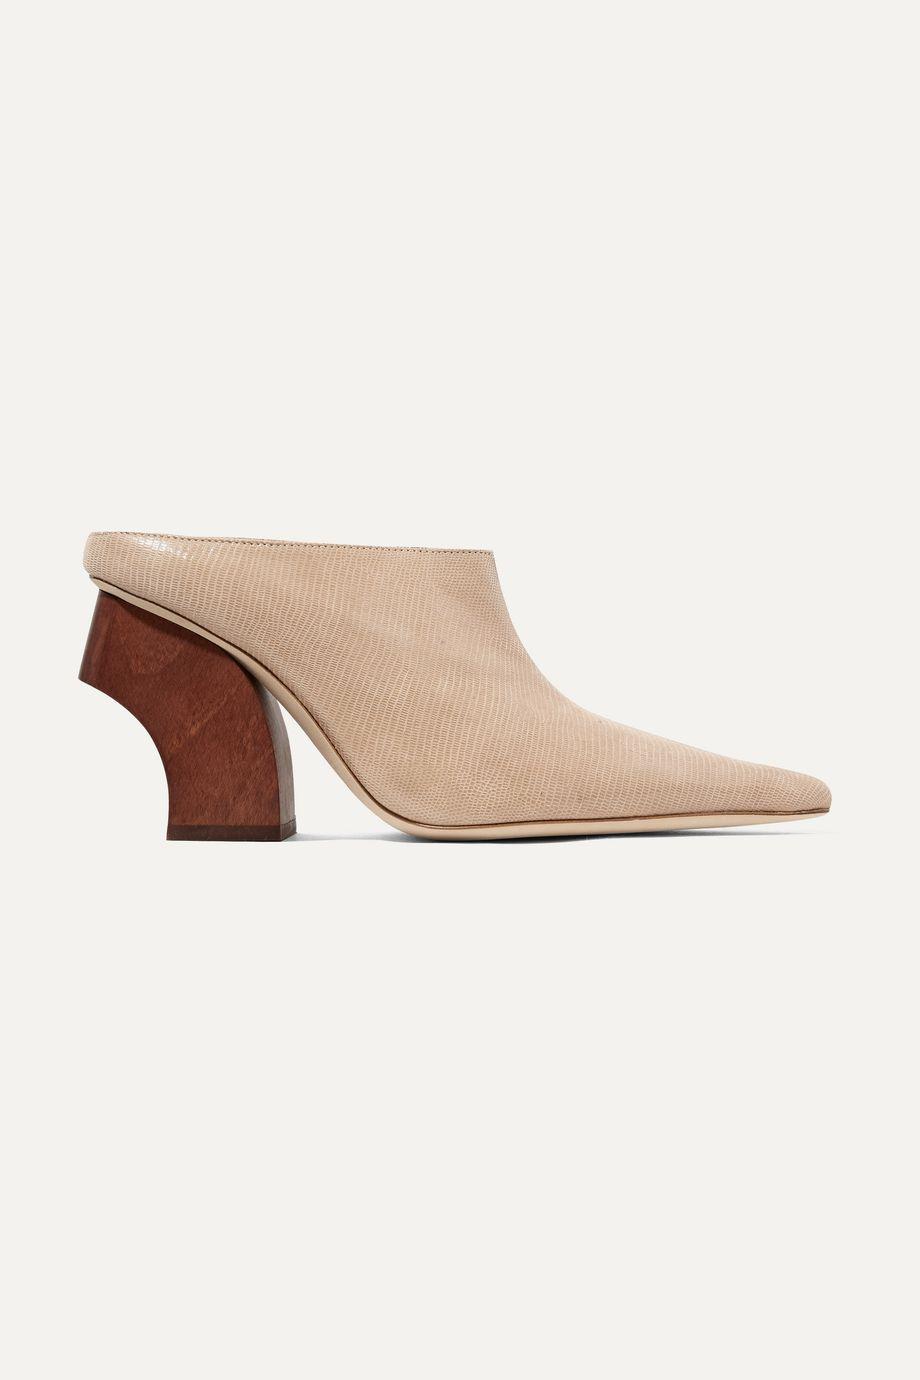 REJINA PYO Yasmin lizard-effect leather mules